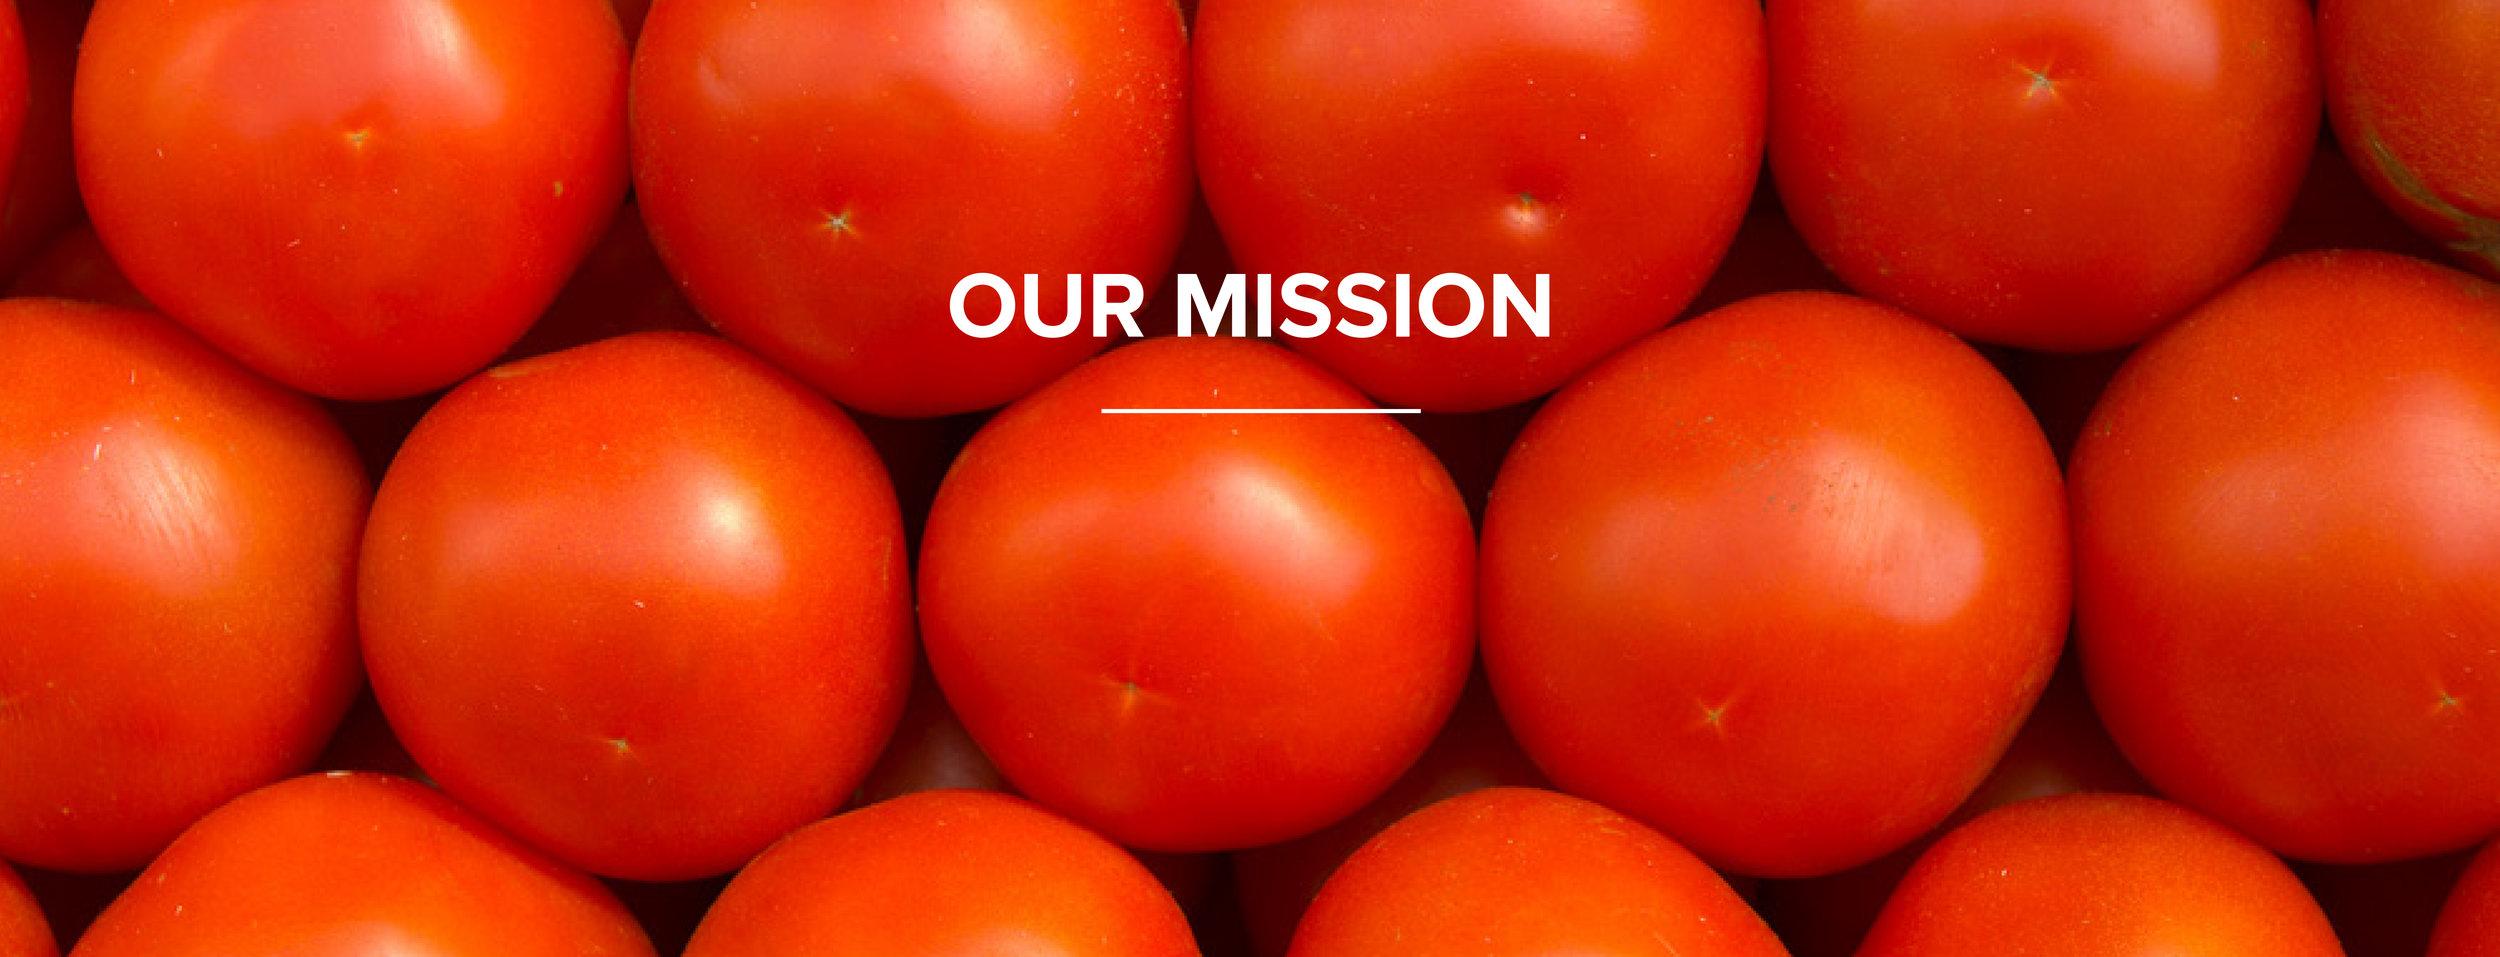 Home_Mission_2.jpg